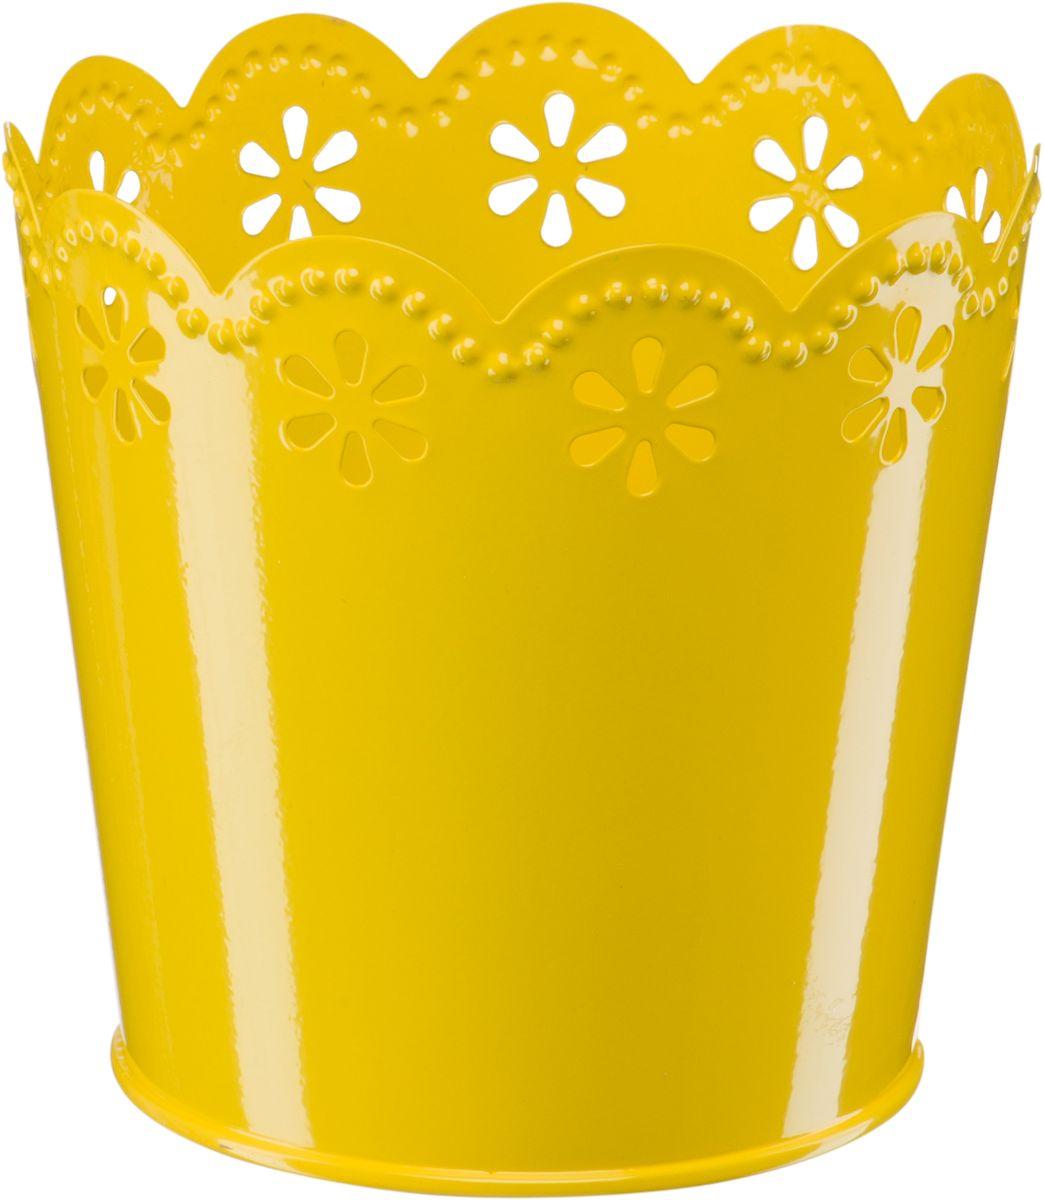 Кашпо Engard, цвет: желтый, 12,5 х 10 х 13 см кашпо engard цвет желтый 12 5 х 10 х 13 см